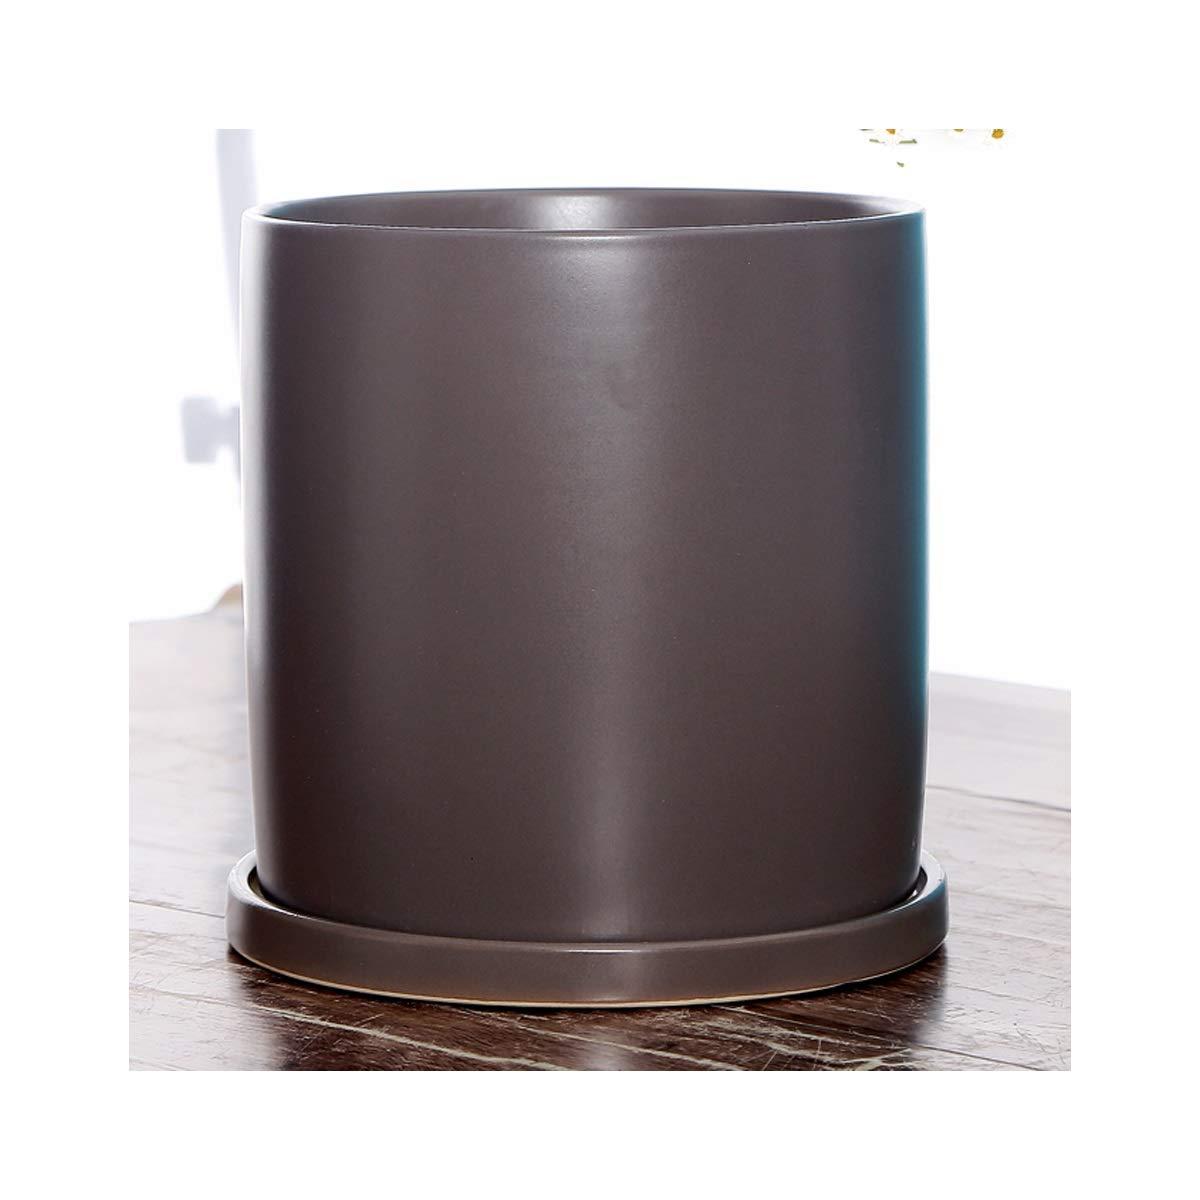 YINJIESHANGMAO Ceramic Flower Pot, Cylindrical Flower Pot with Tray Materials (Color : Brown, Size : Medium) by YINJIESHANGMAO